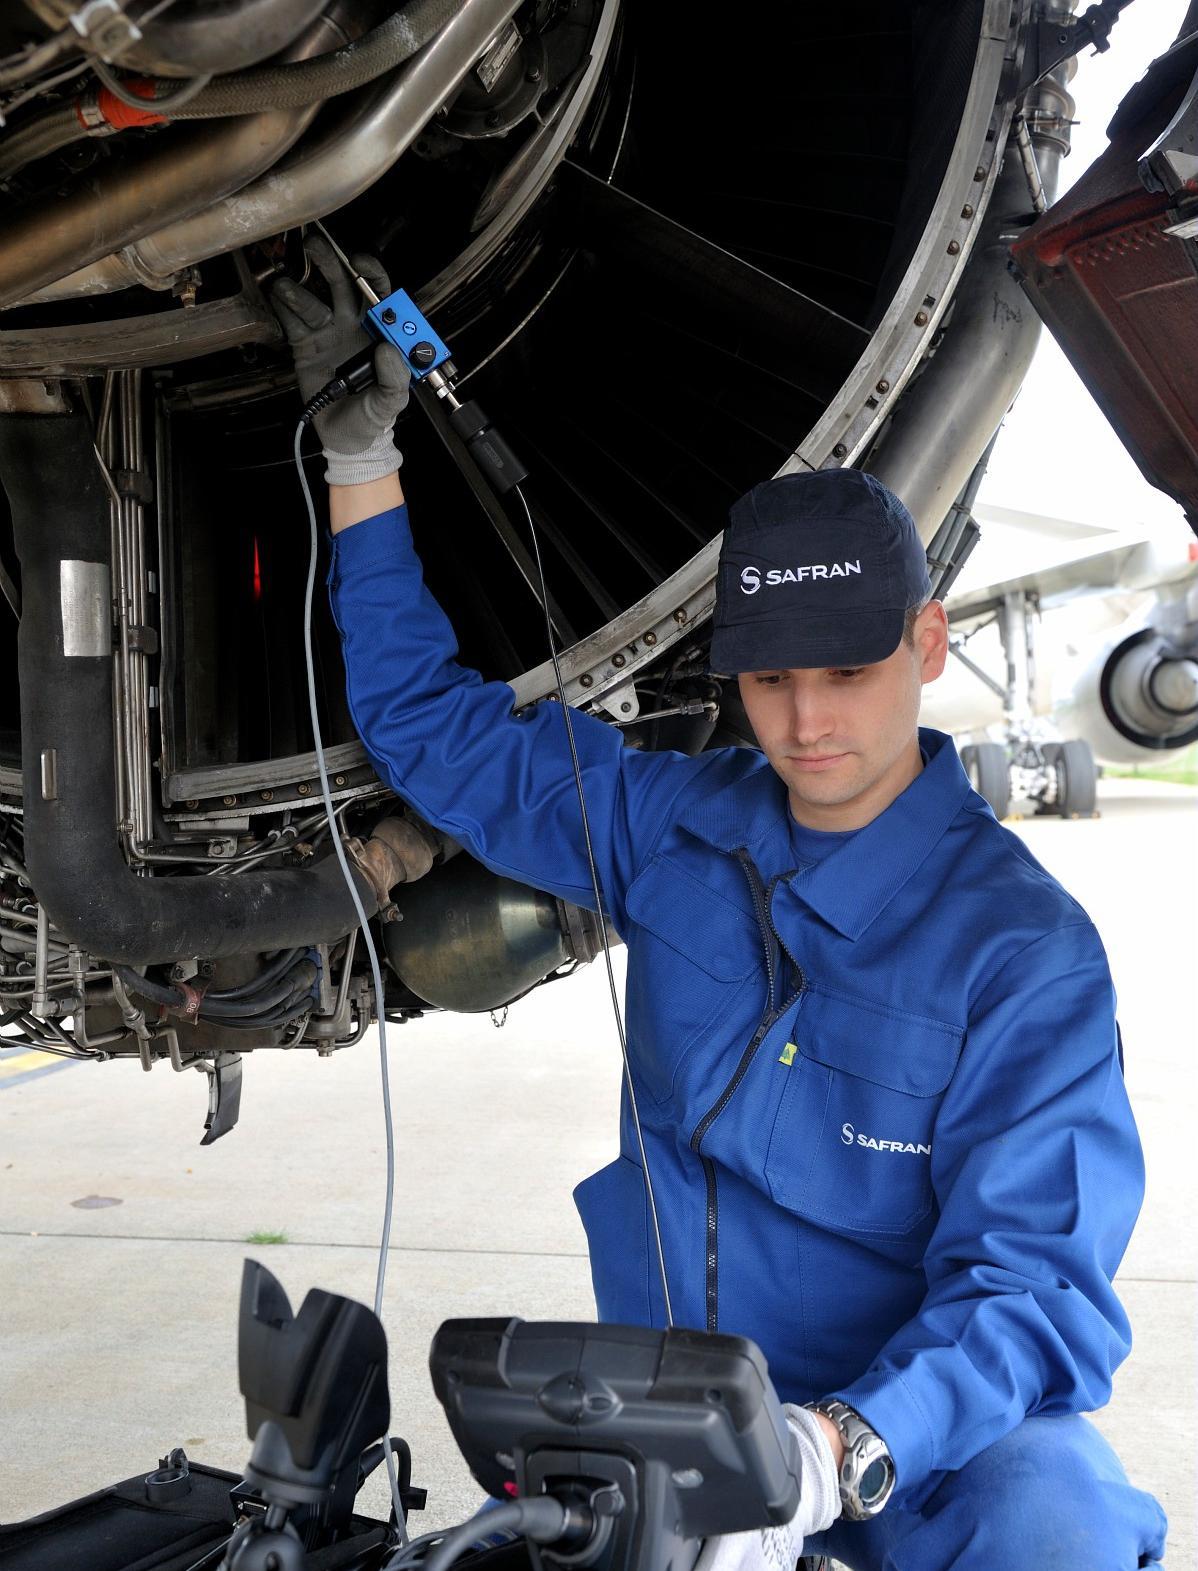 Tarmac Aerosave,maintenance on wing